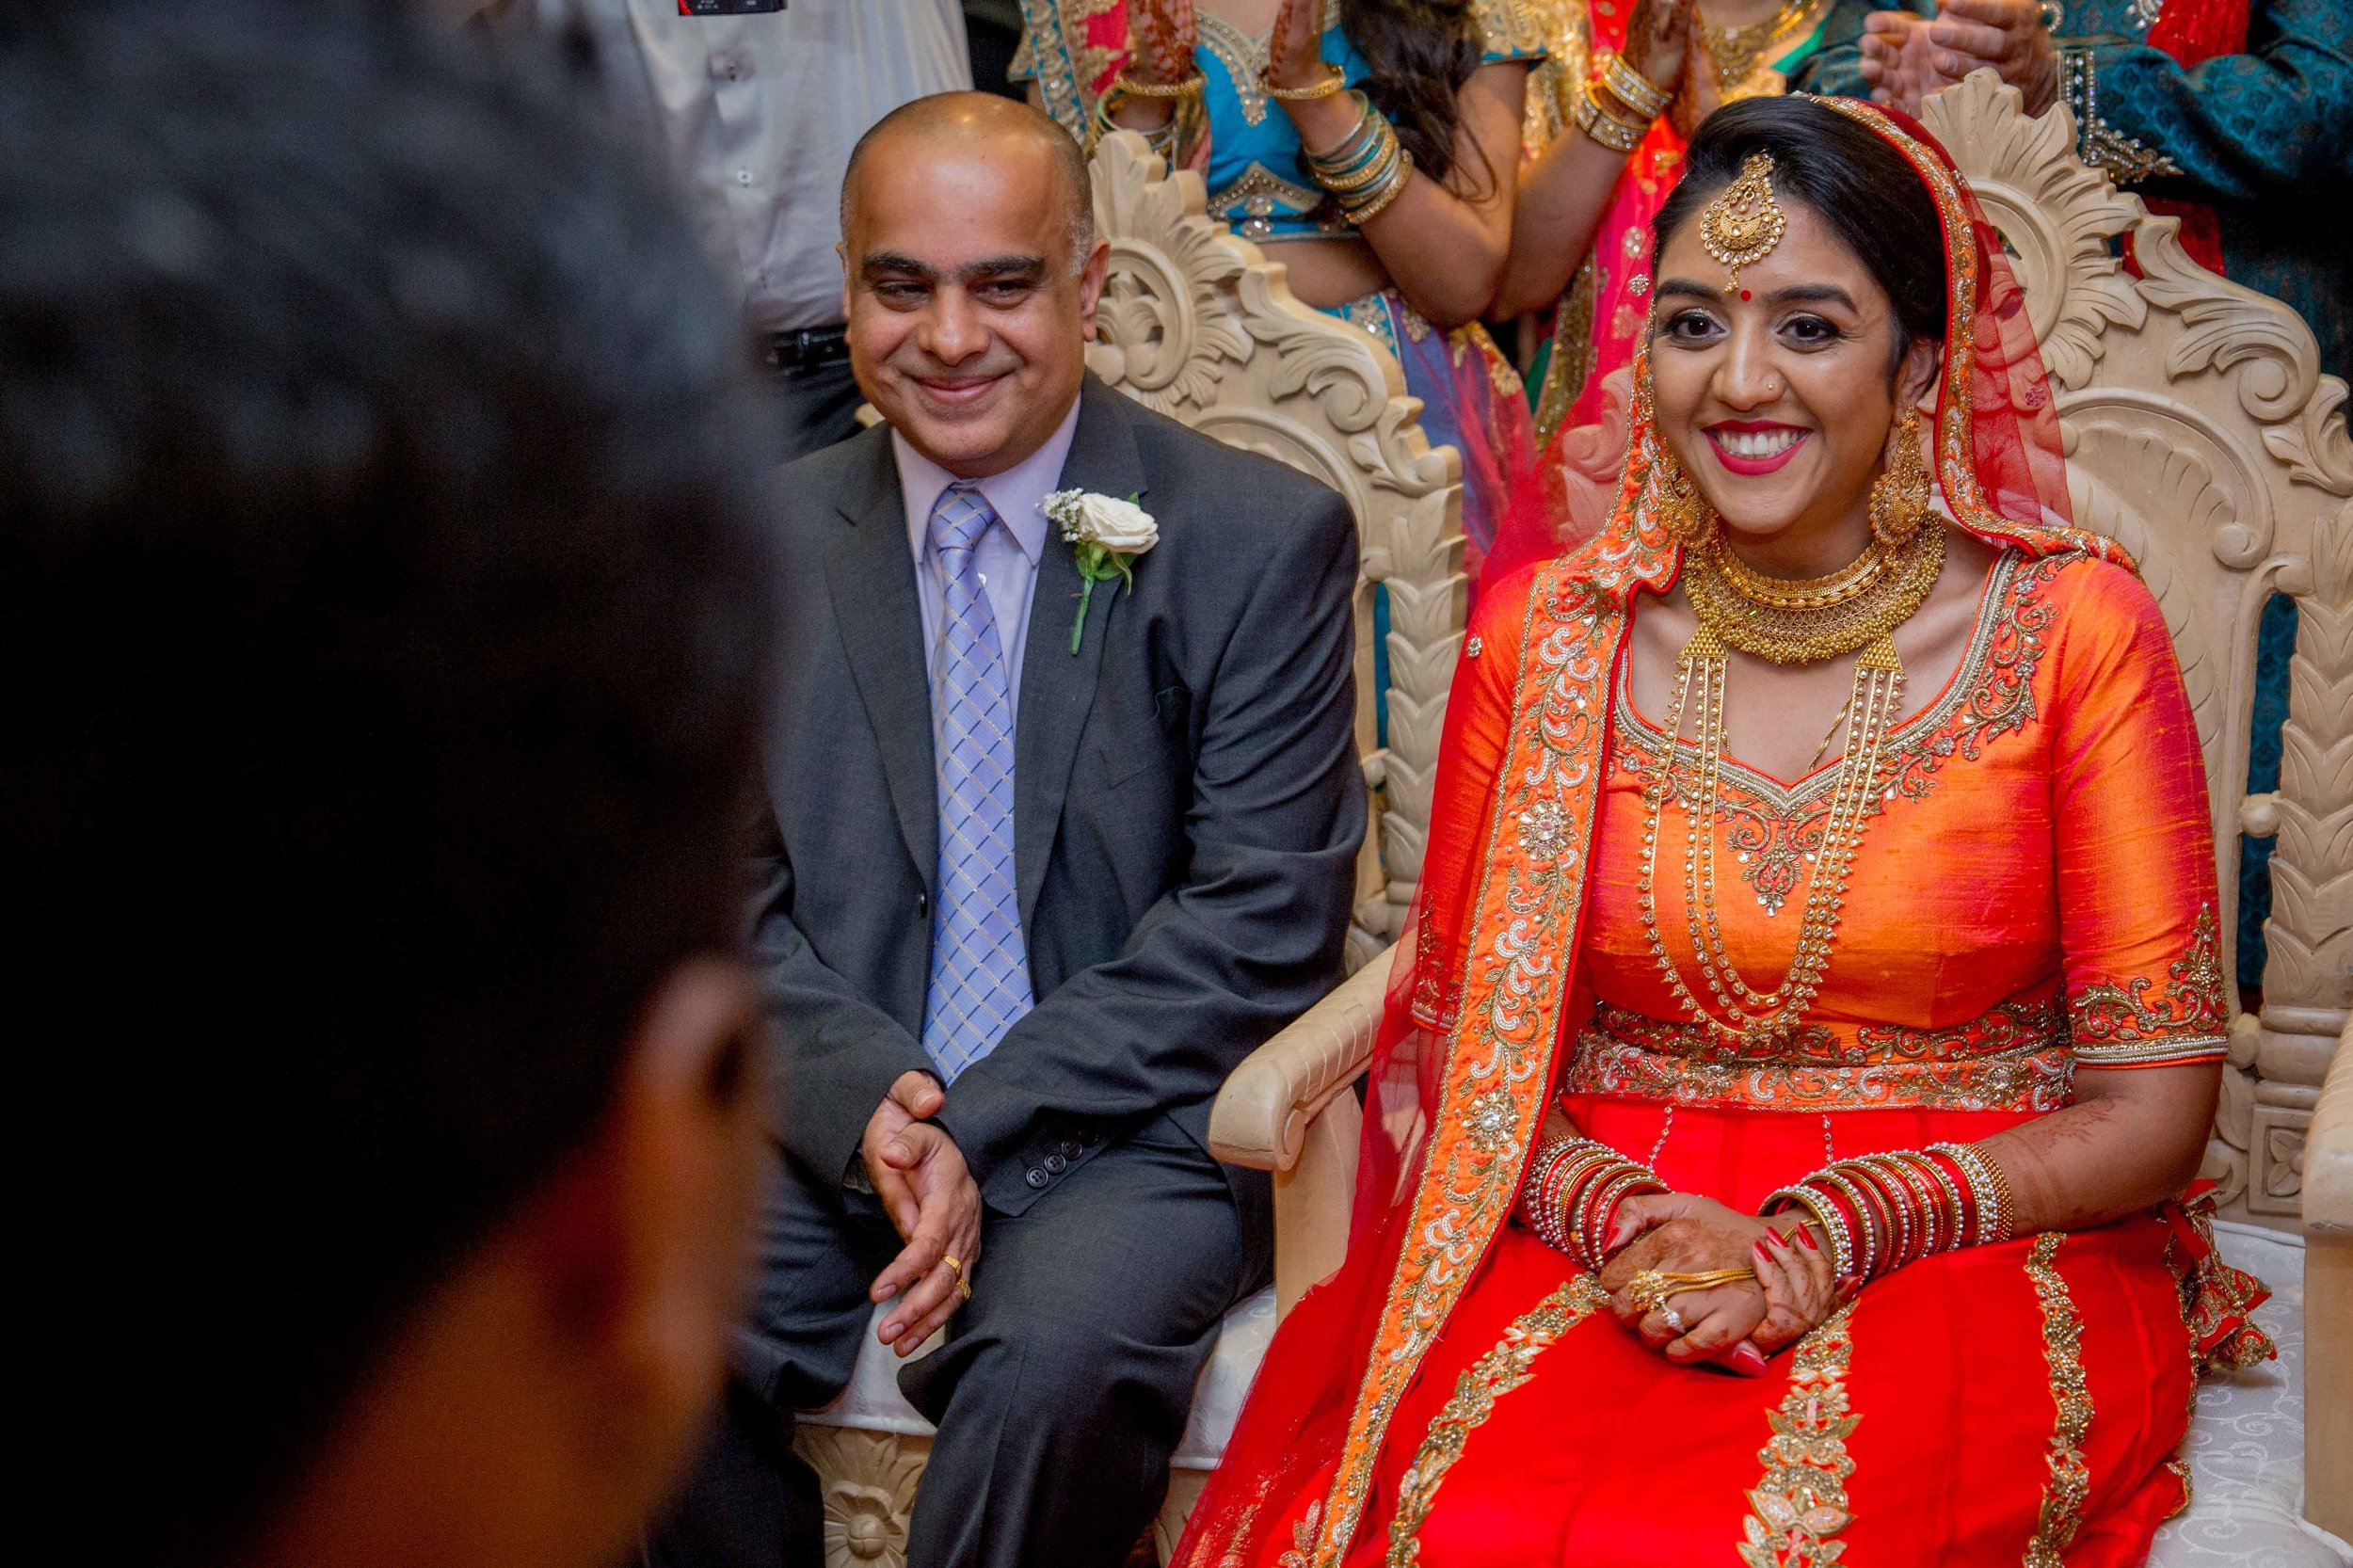 premier-banquetting-london-Hindu-asian-wedding-photographer-natalia-smith-photography-18.jpg